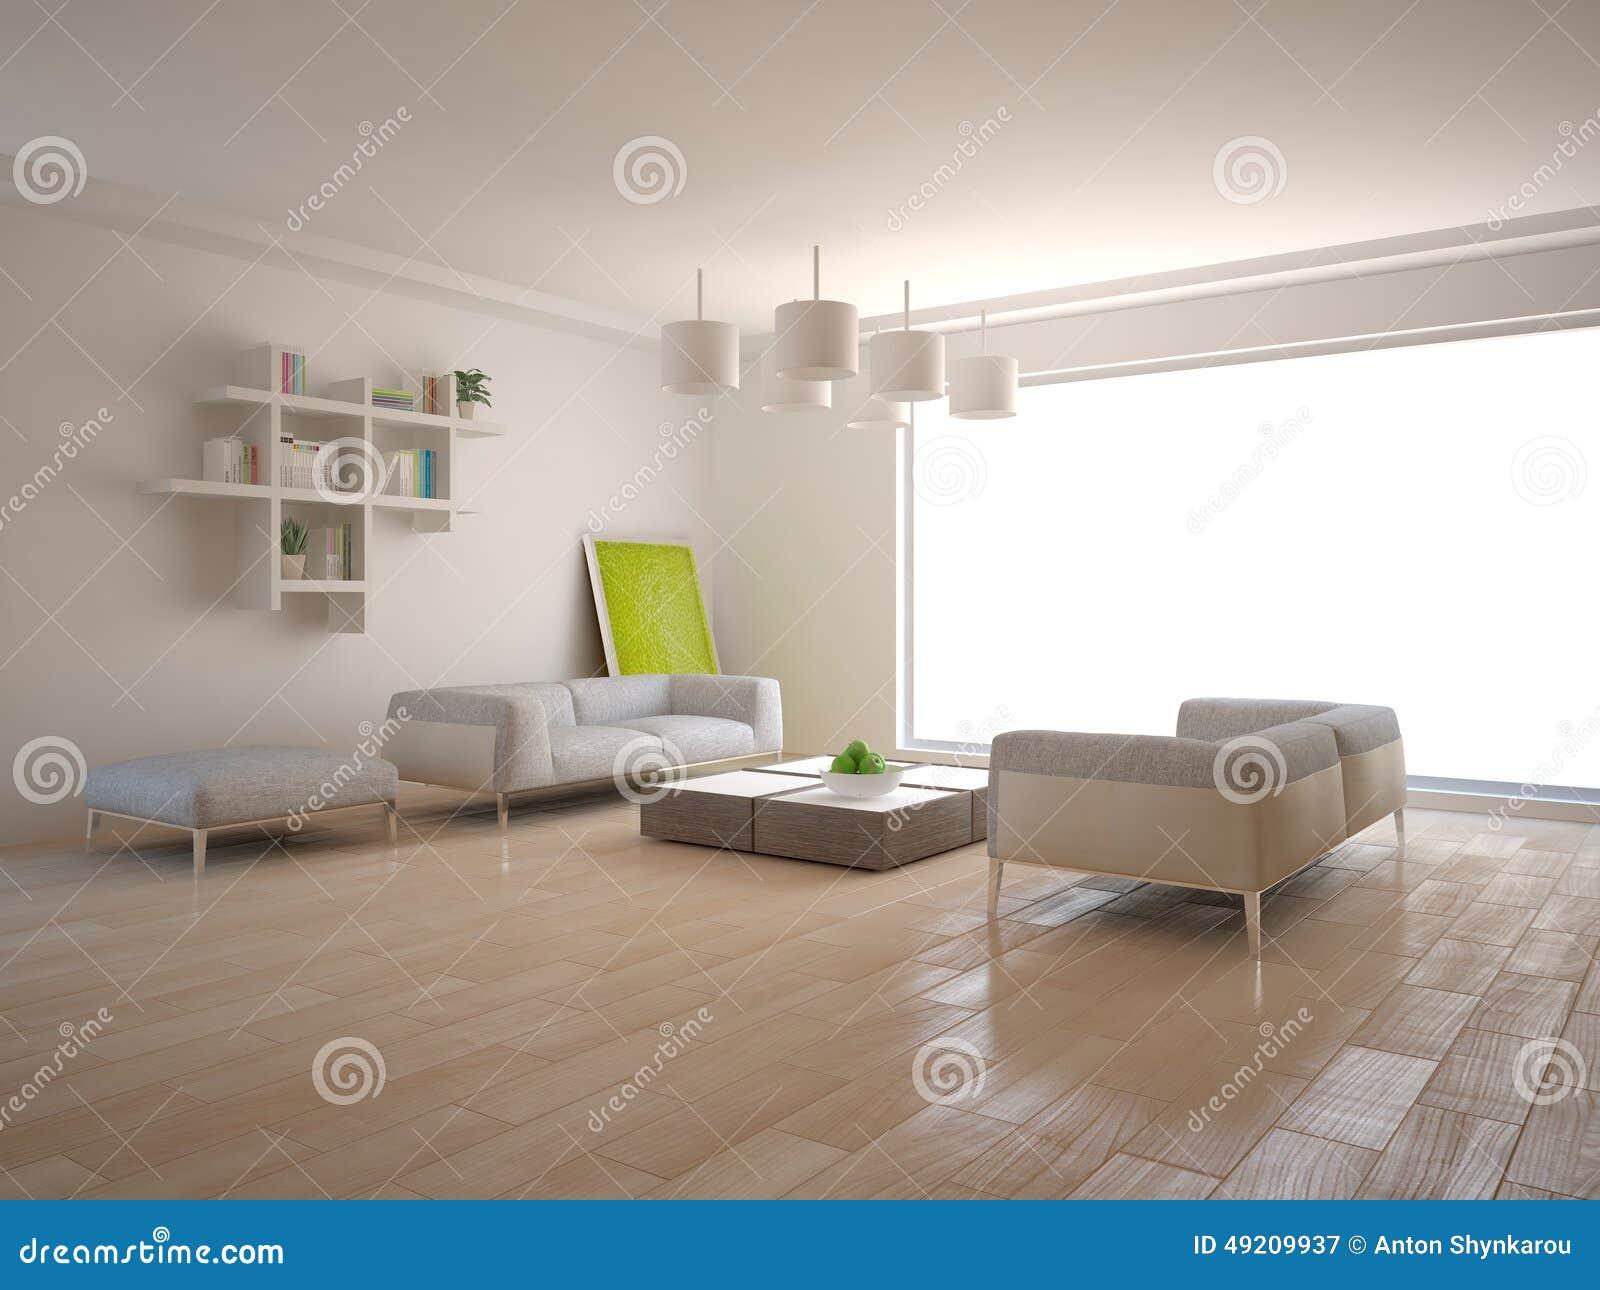 White interior concept for living room